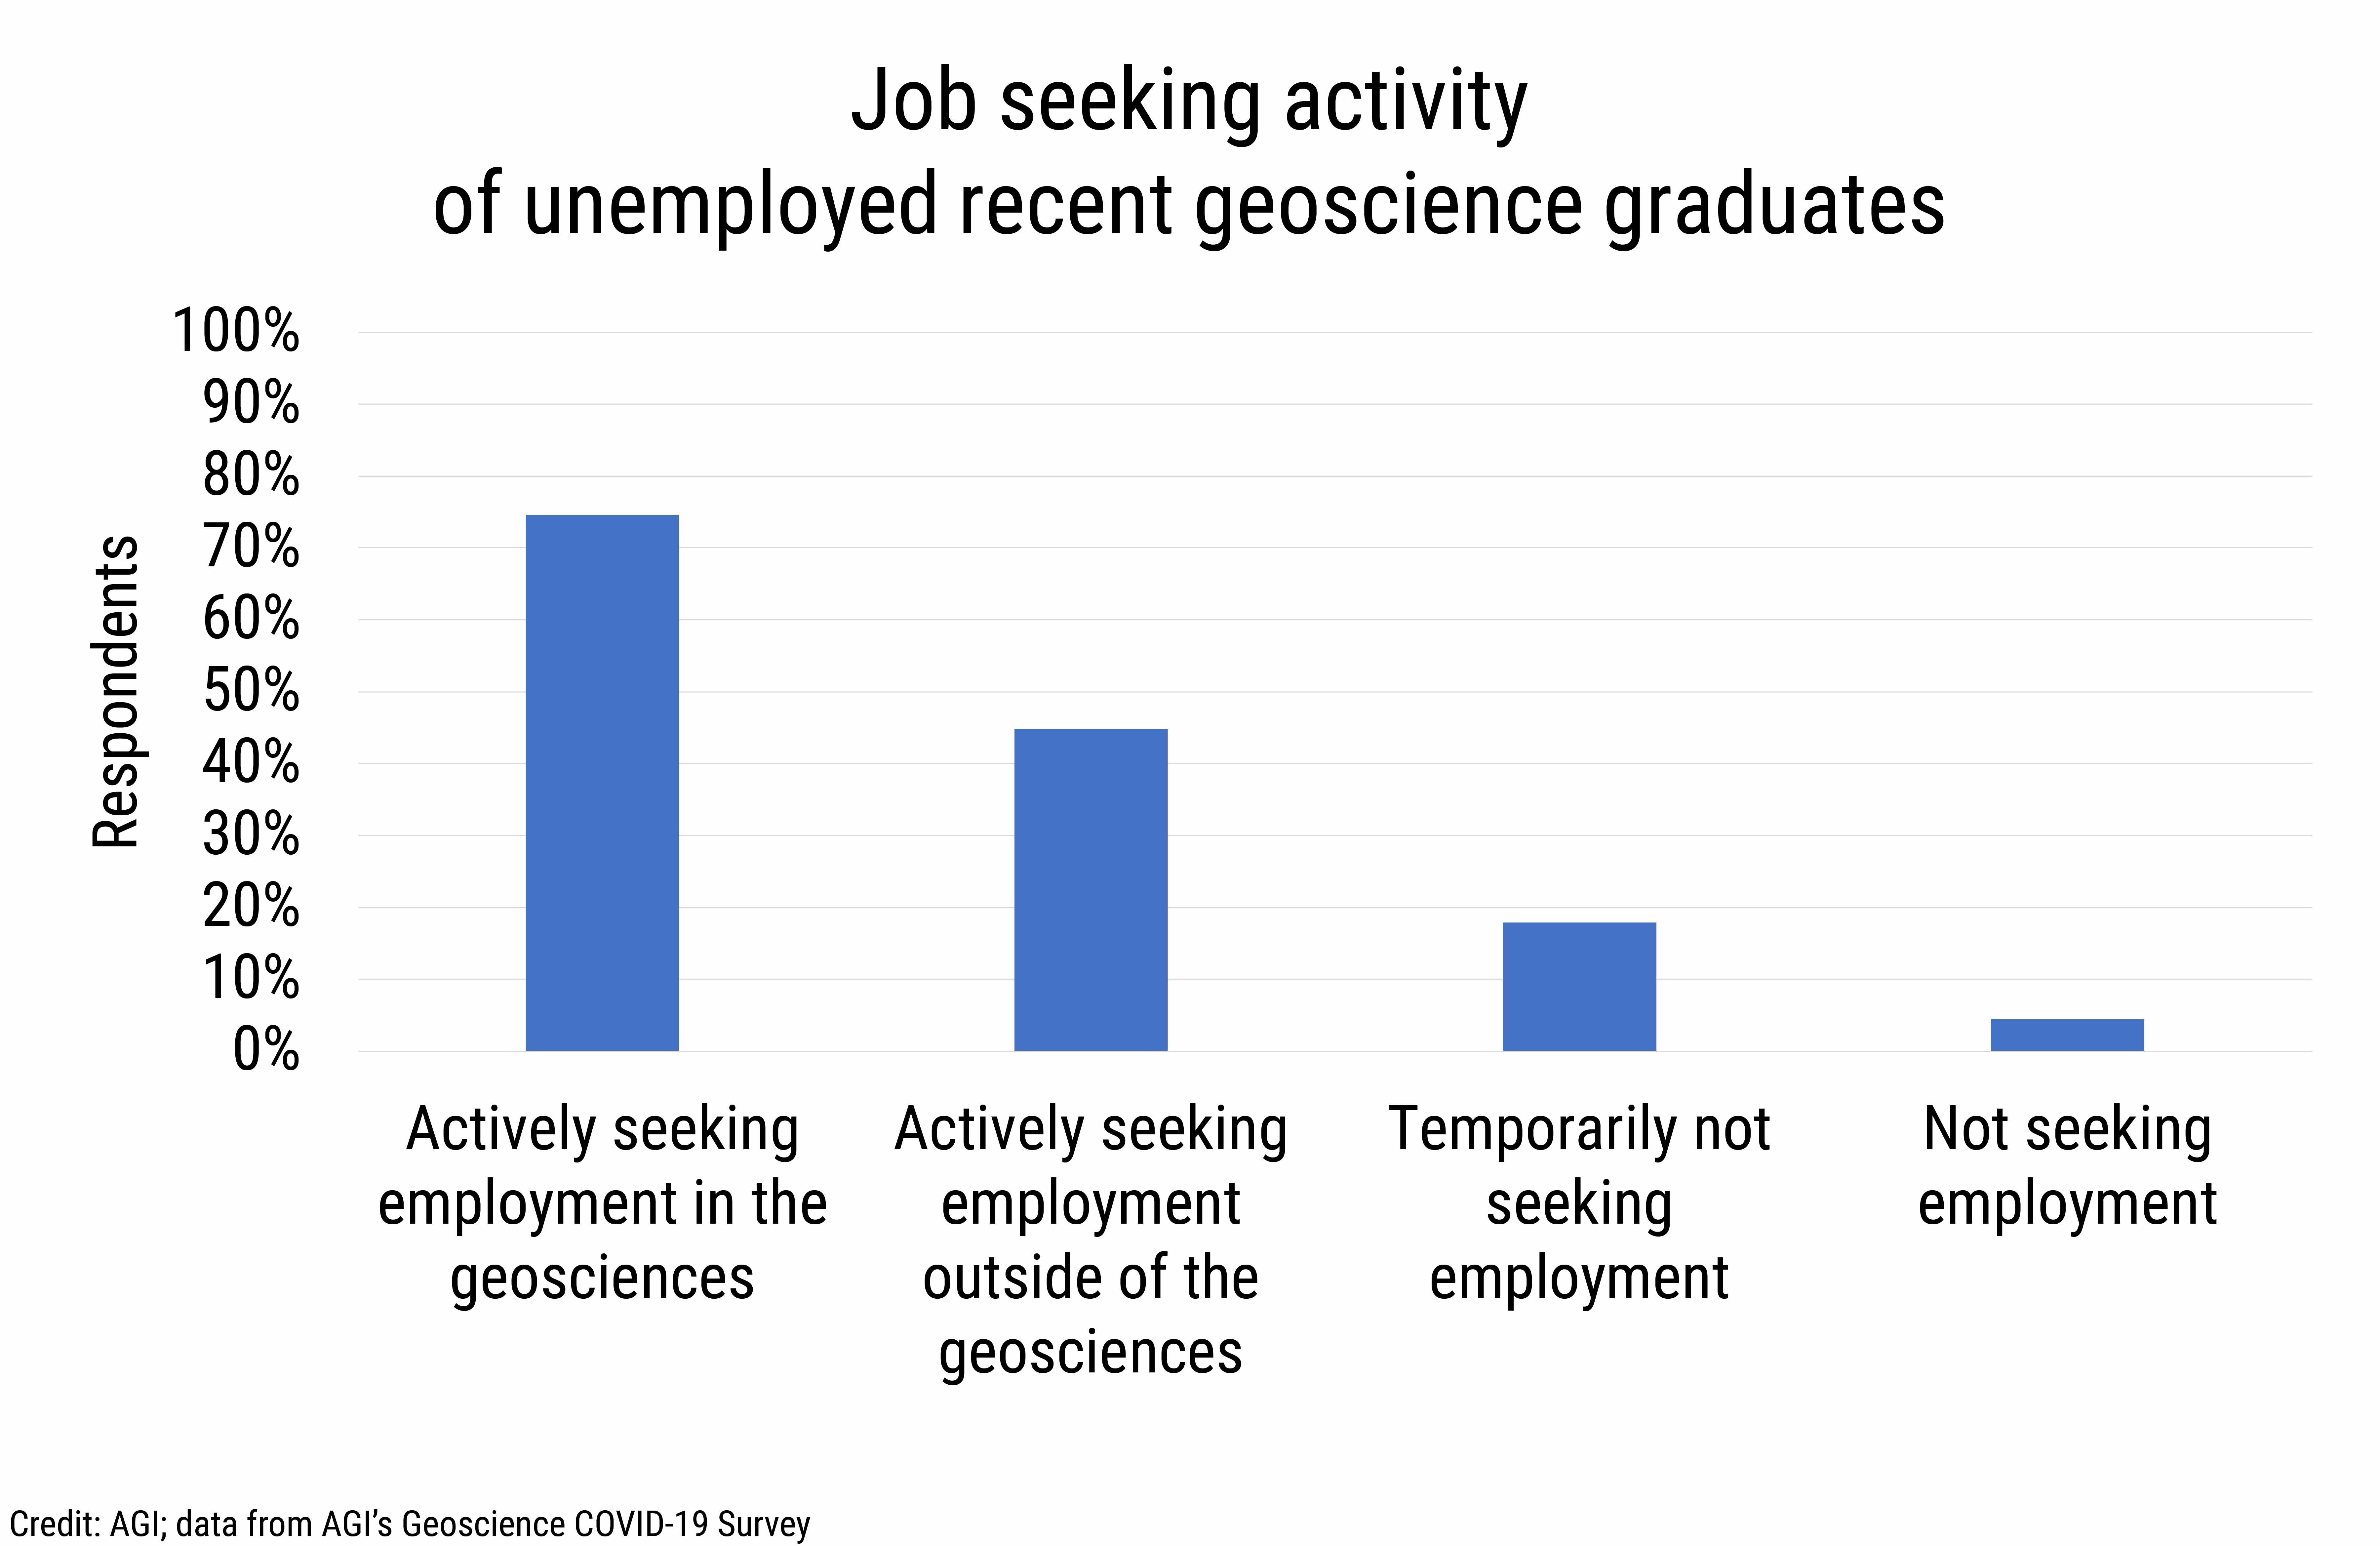 DB_2021-003_chart12: Job seeking activity of unemployed recent geoscience graduates (Credit: AGI; data from AGI's Geoscience COVID-19 Survey)